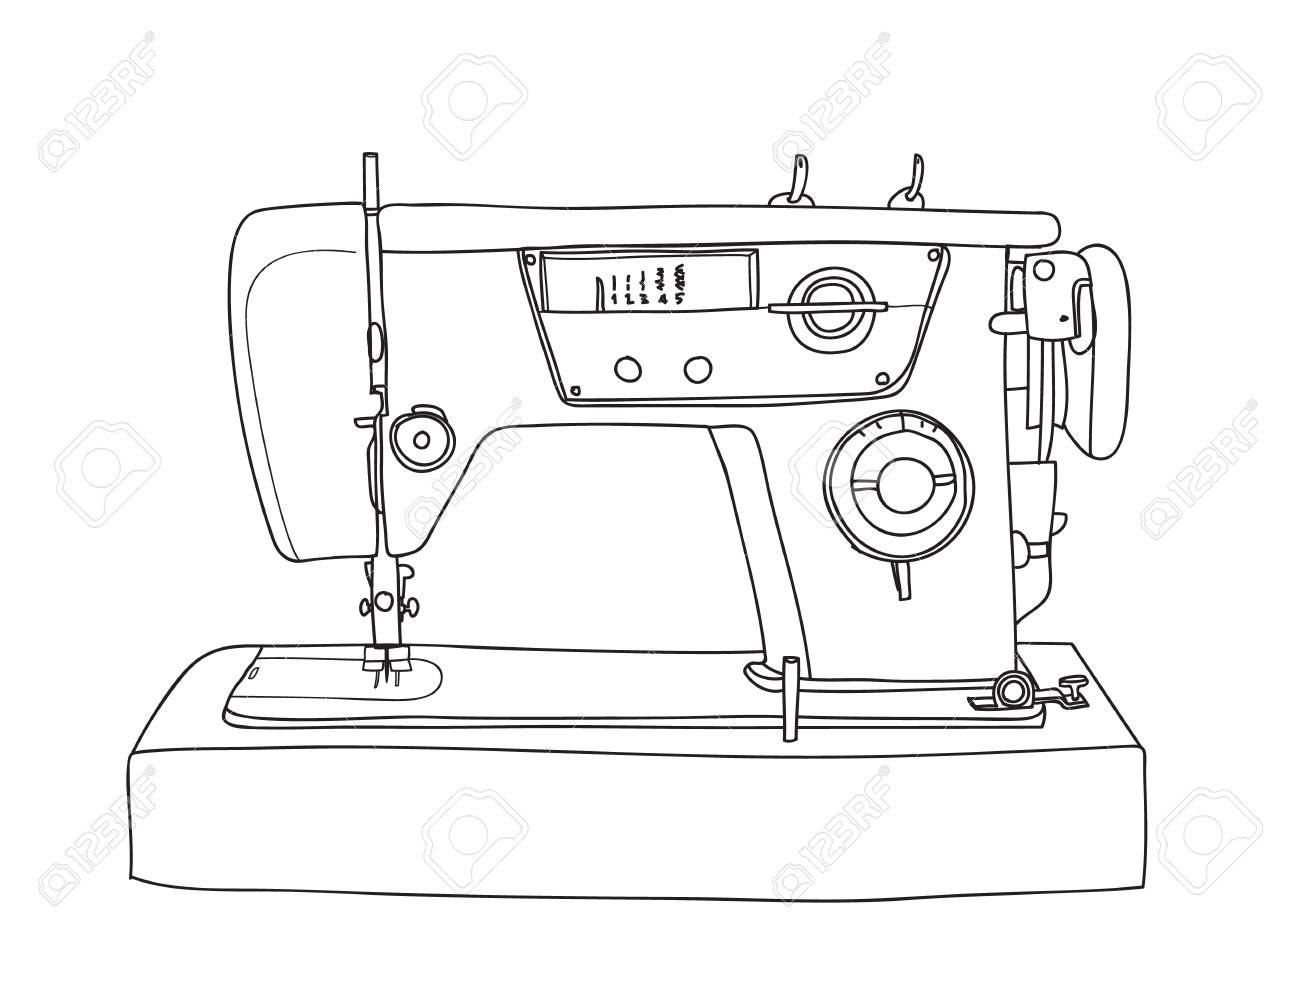 1300x1008 Sewing Retro Machine Cute Vintage Hand Drawn Vector Line Art